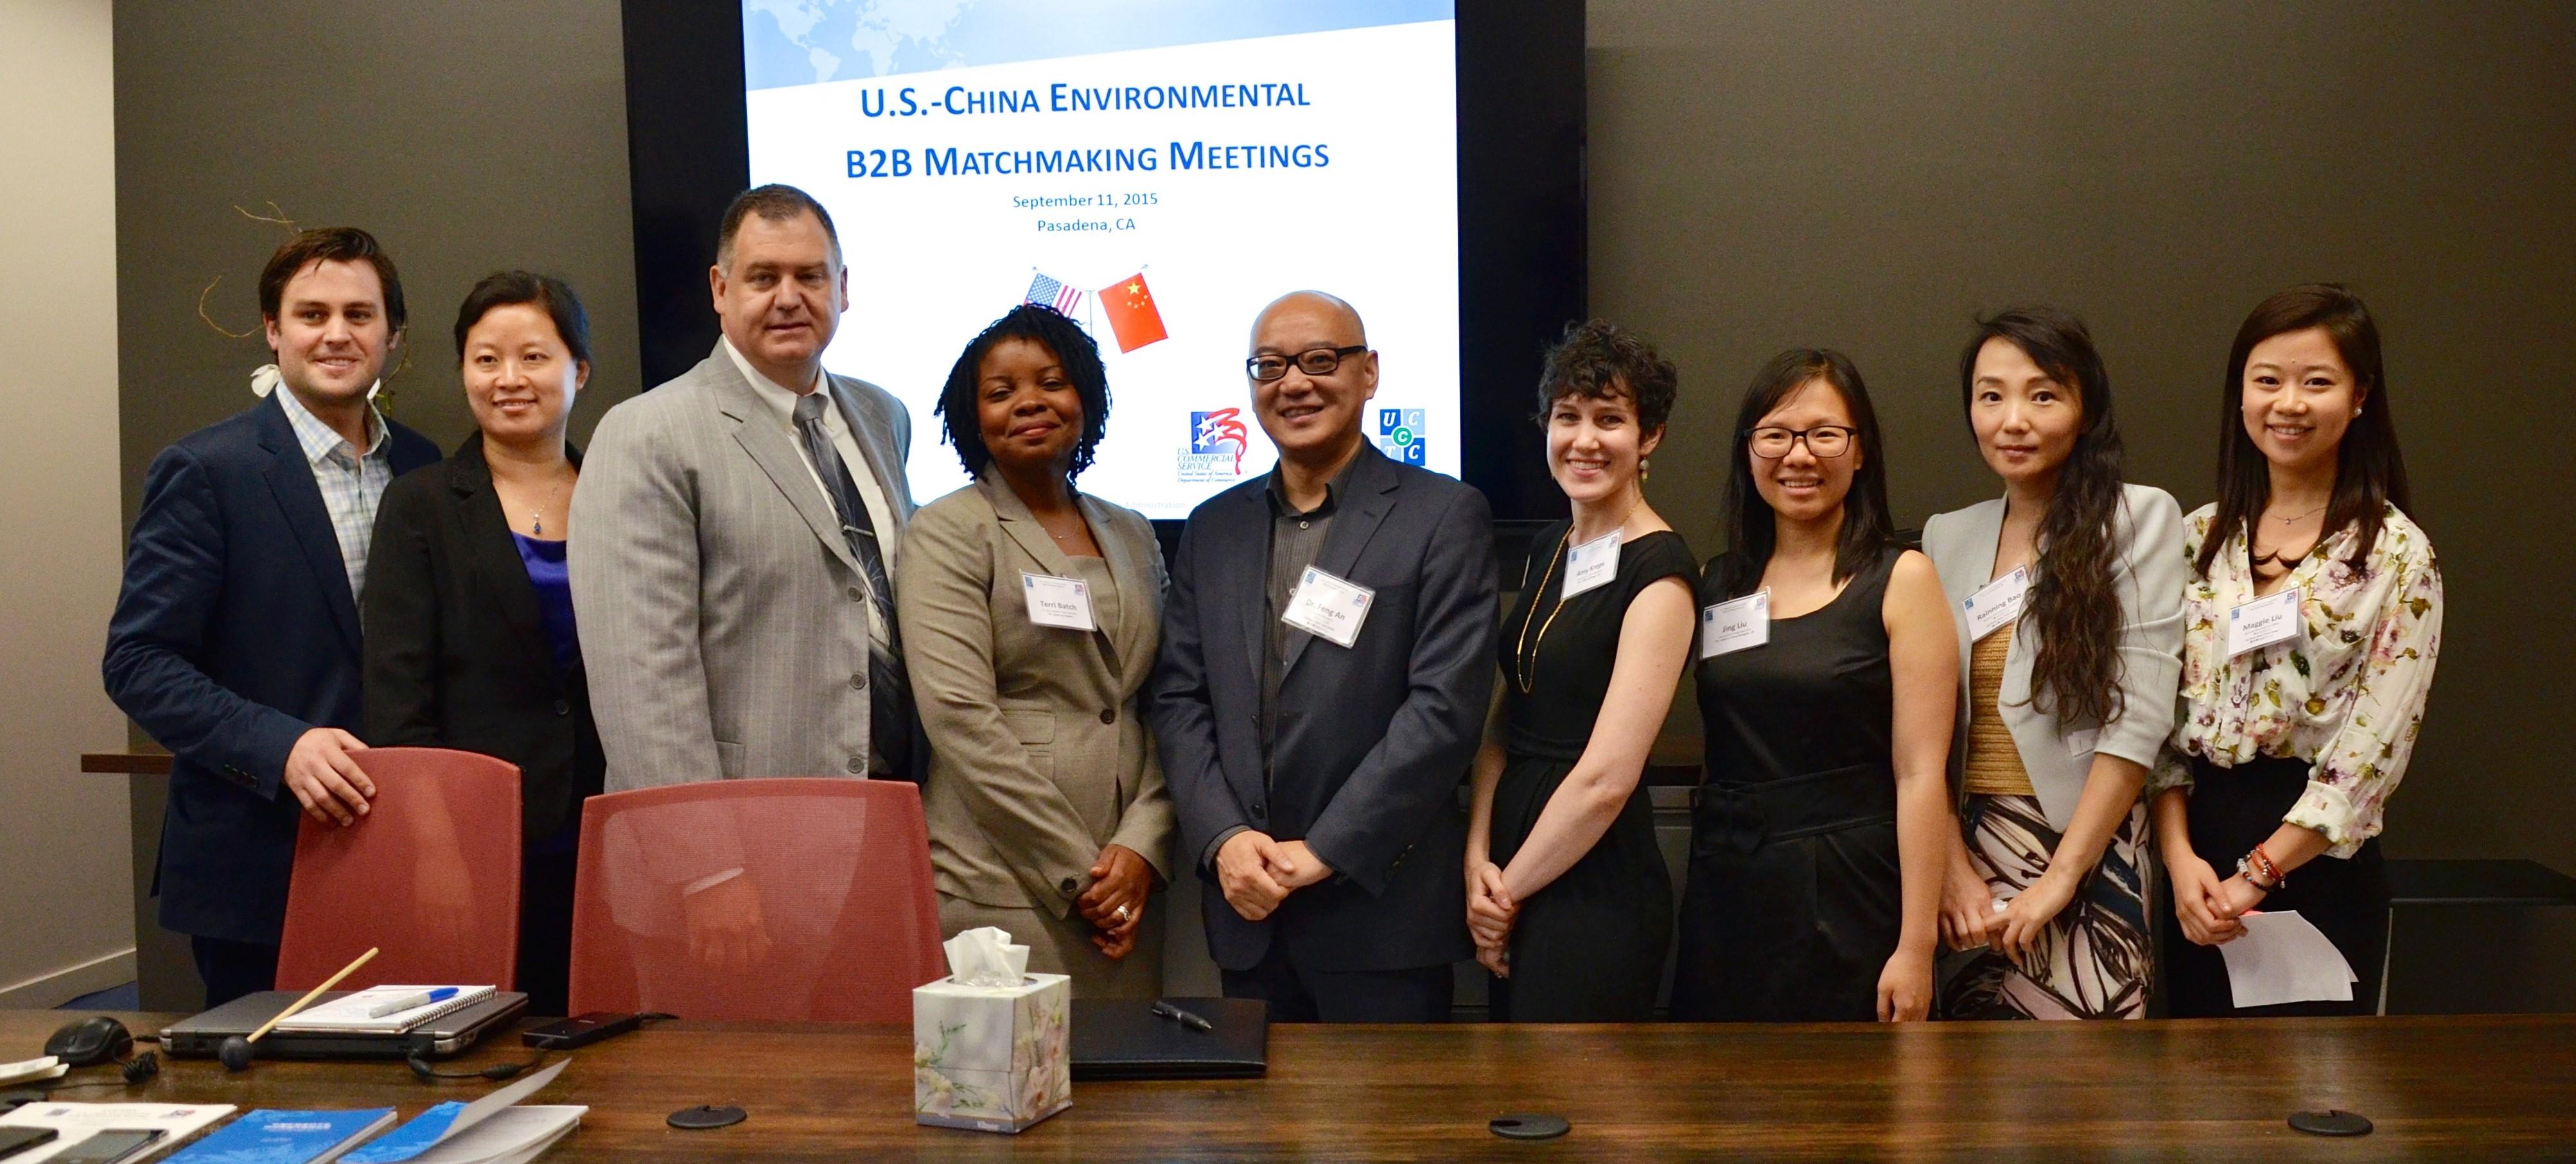 SINO-U.S. Environmental Industry CEO B2B Event